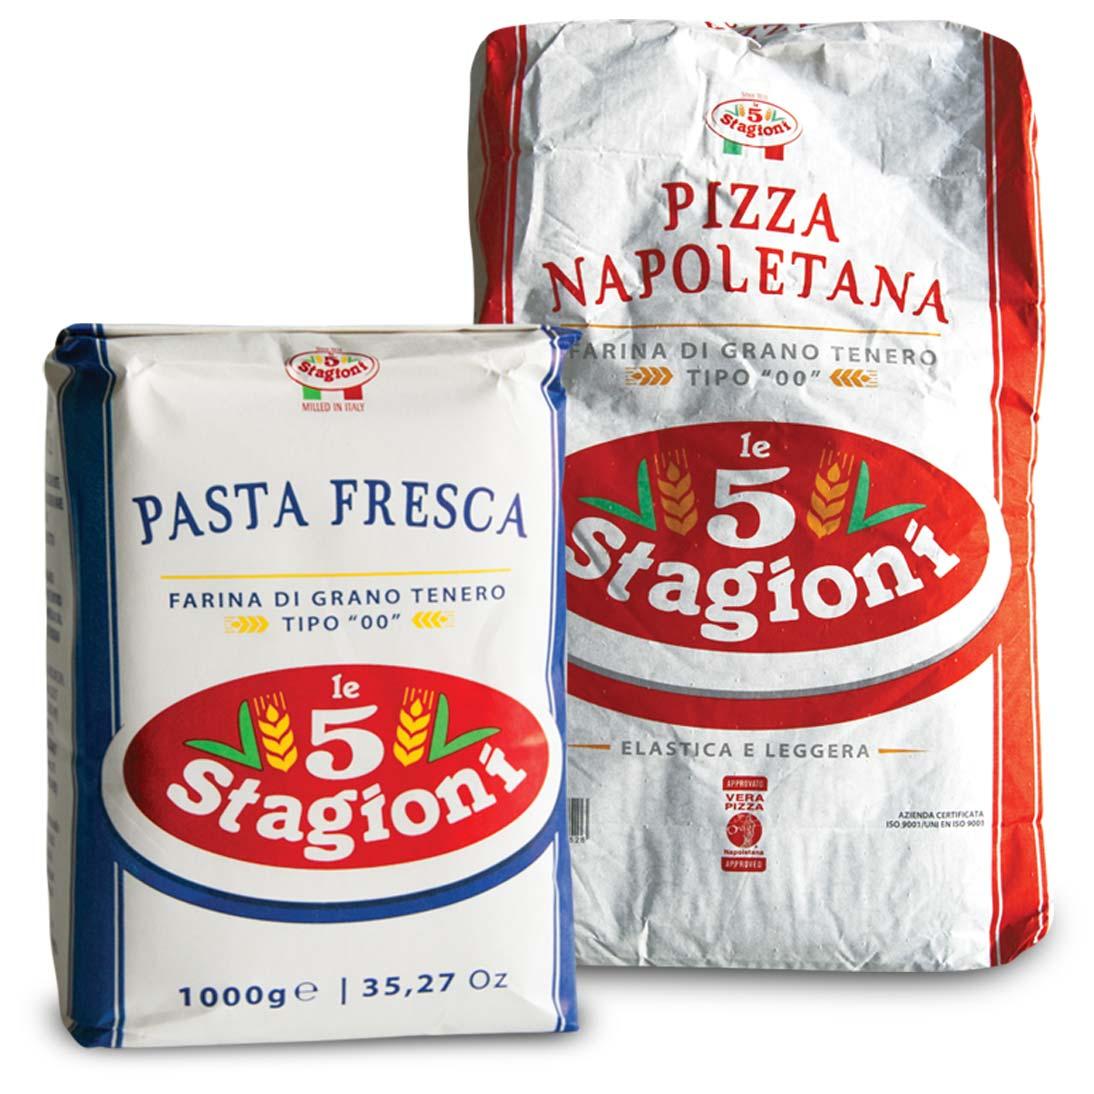 Le 5 Stagioni Pizza & Pasta Flour